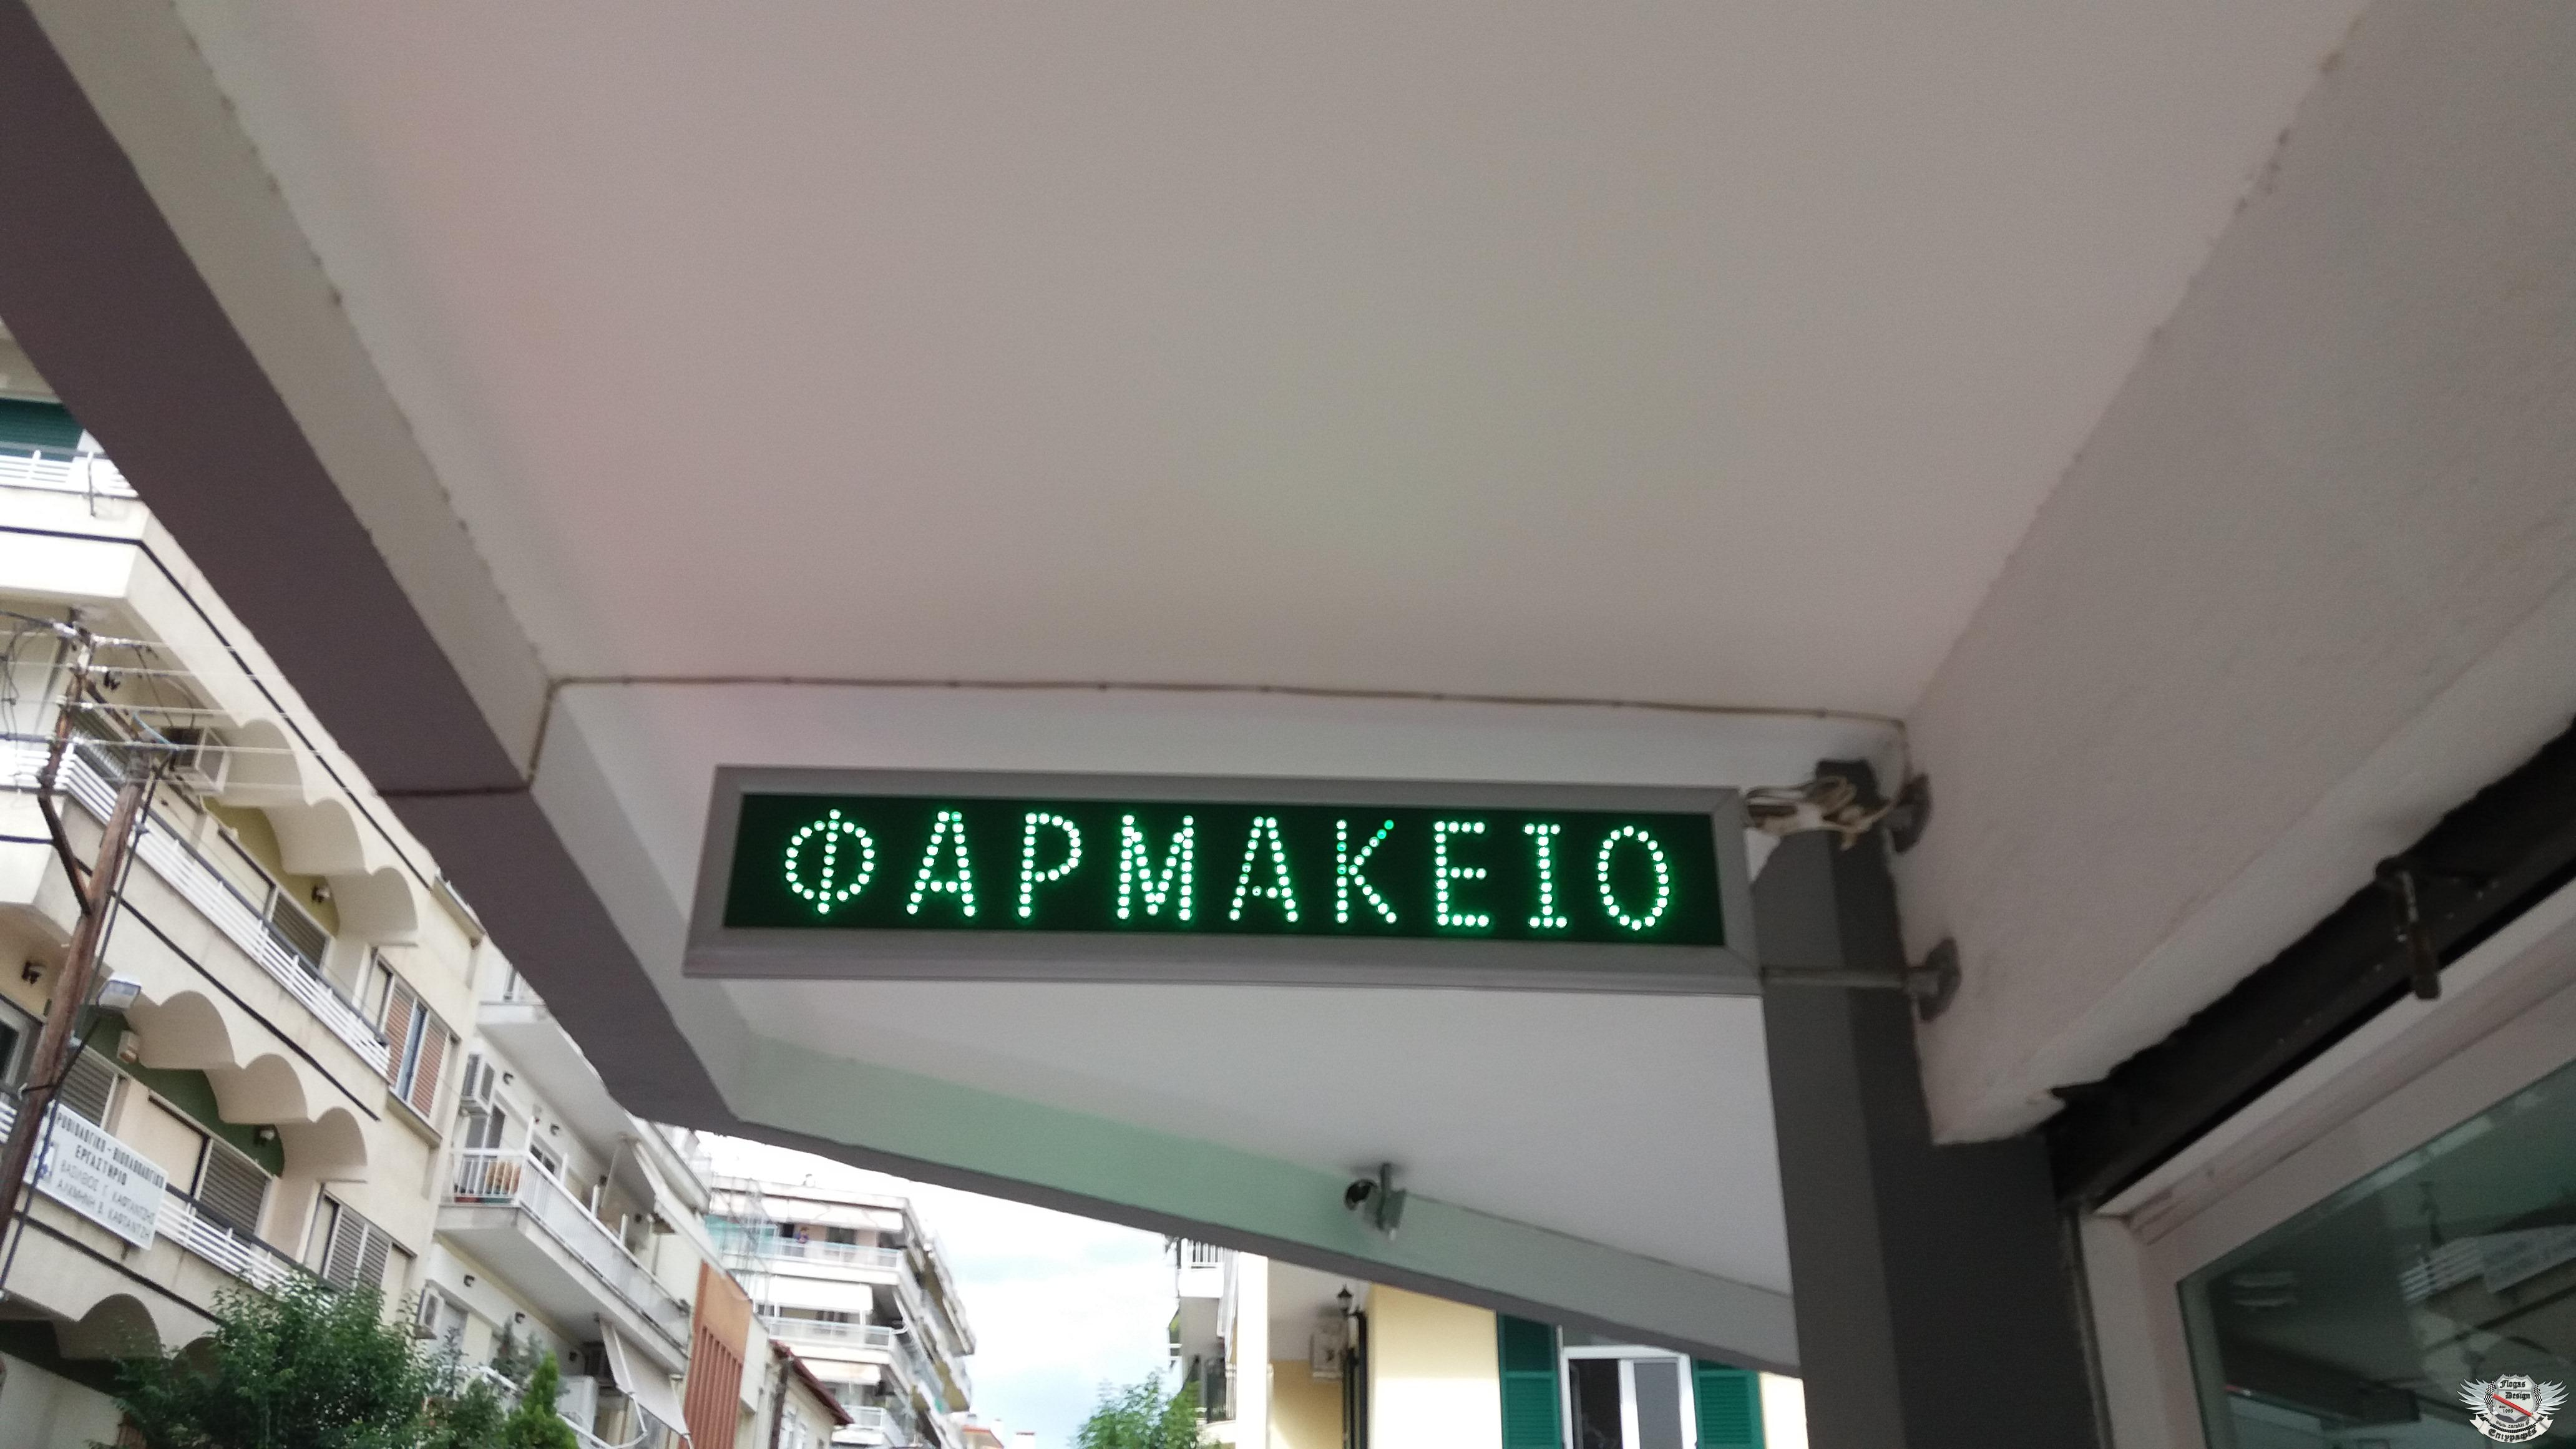 LED DISPLAY  - ΗΛΕΚΤΡΟΝΙΚΗ ΕΠΙΓΡΑΦΗ